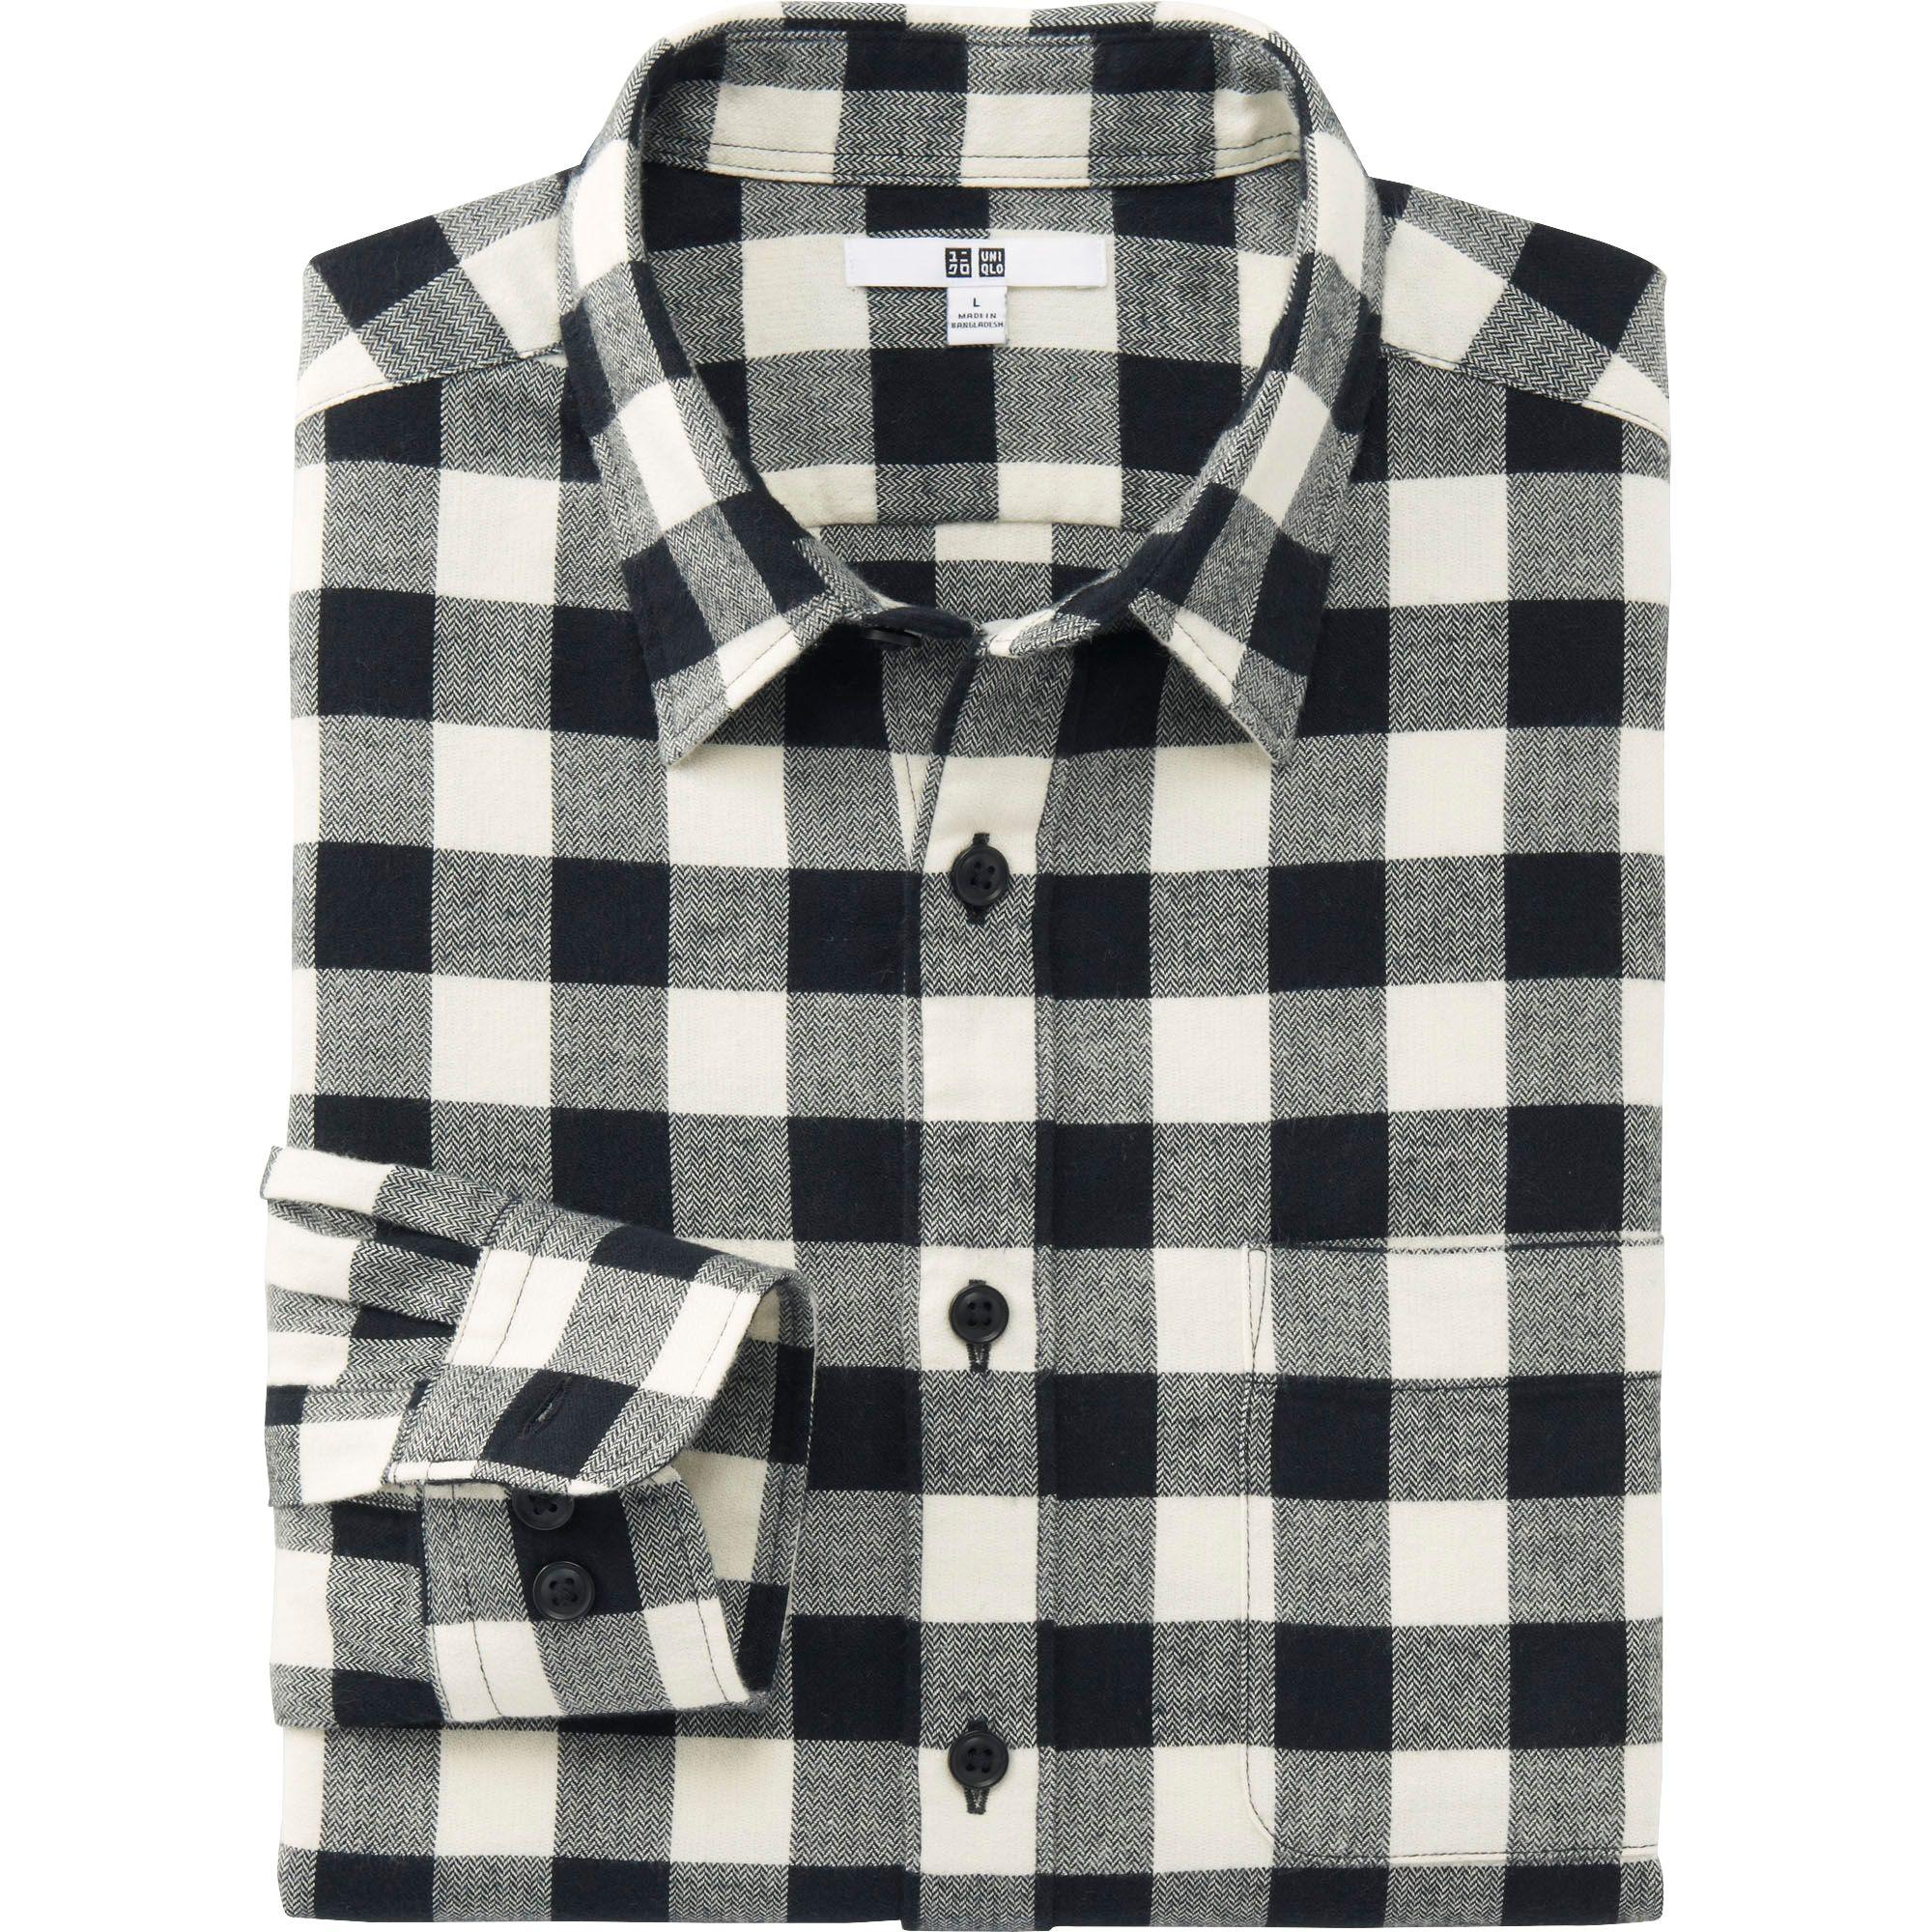 732140b5df7e Lyst - Uniqlo Men Flannel Buffalo Check Long Sleeve Shirt in Black ...